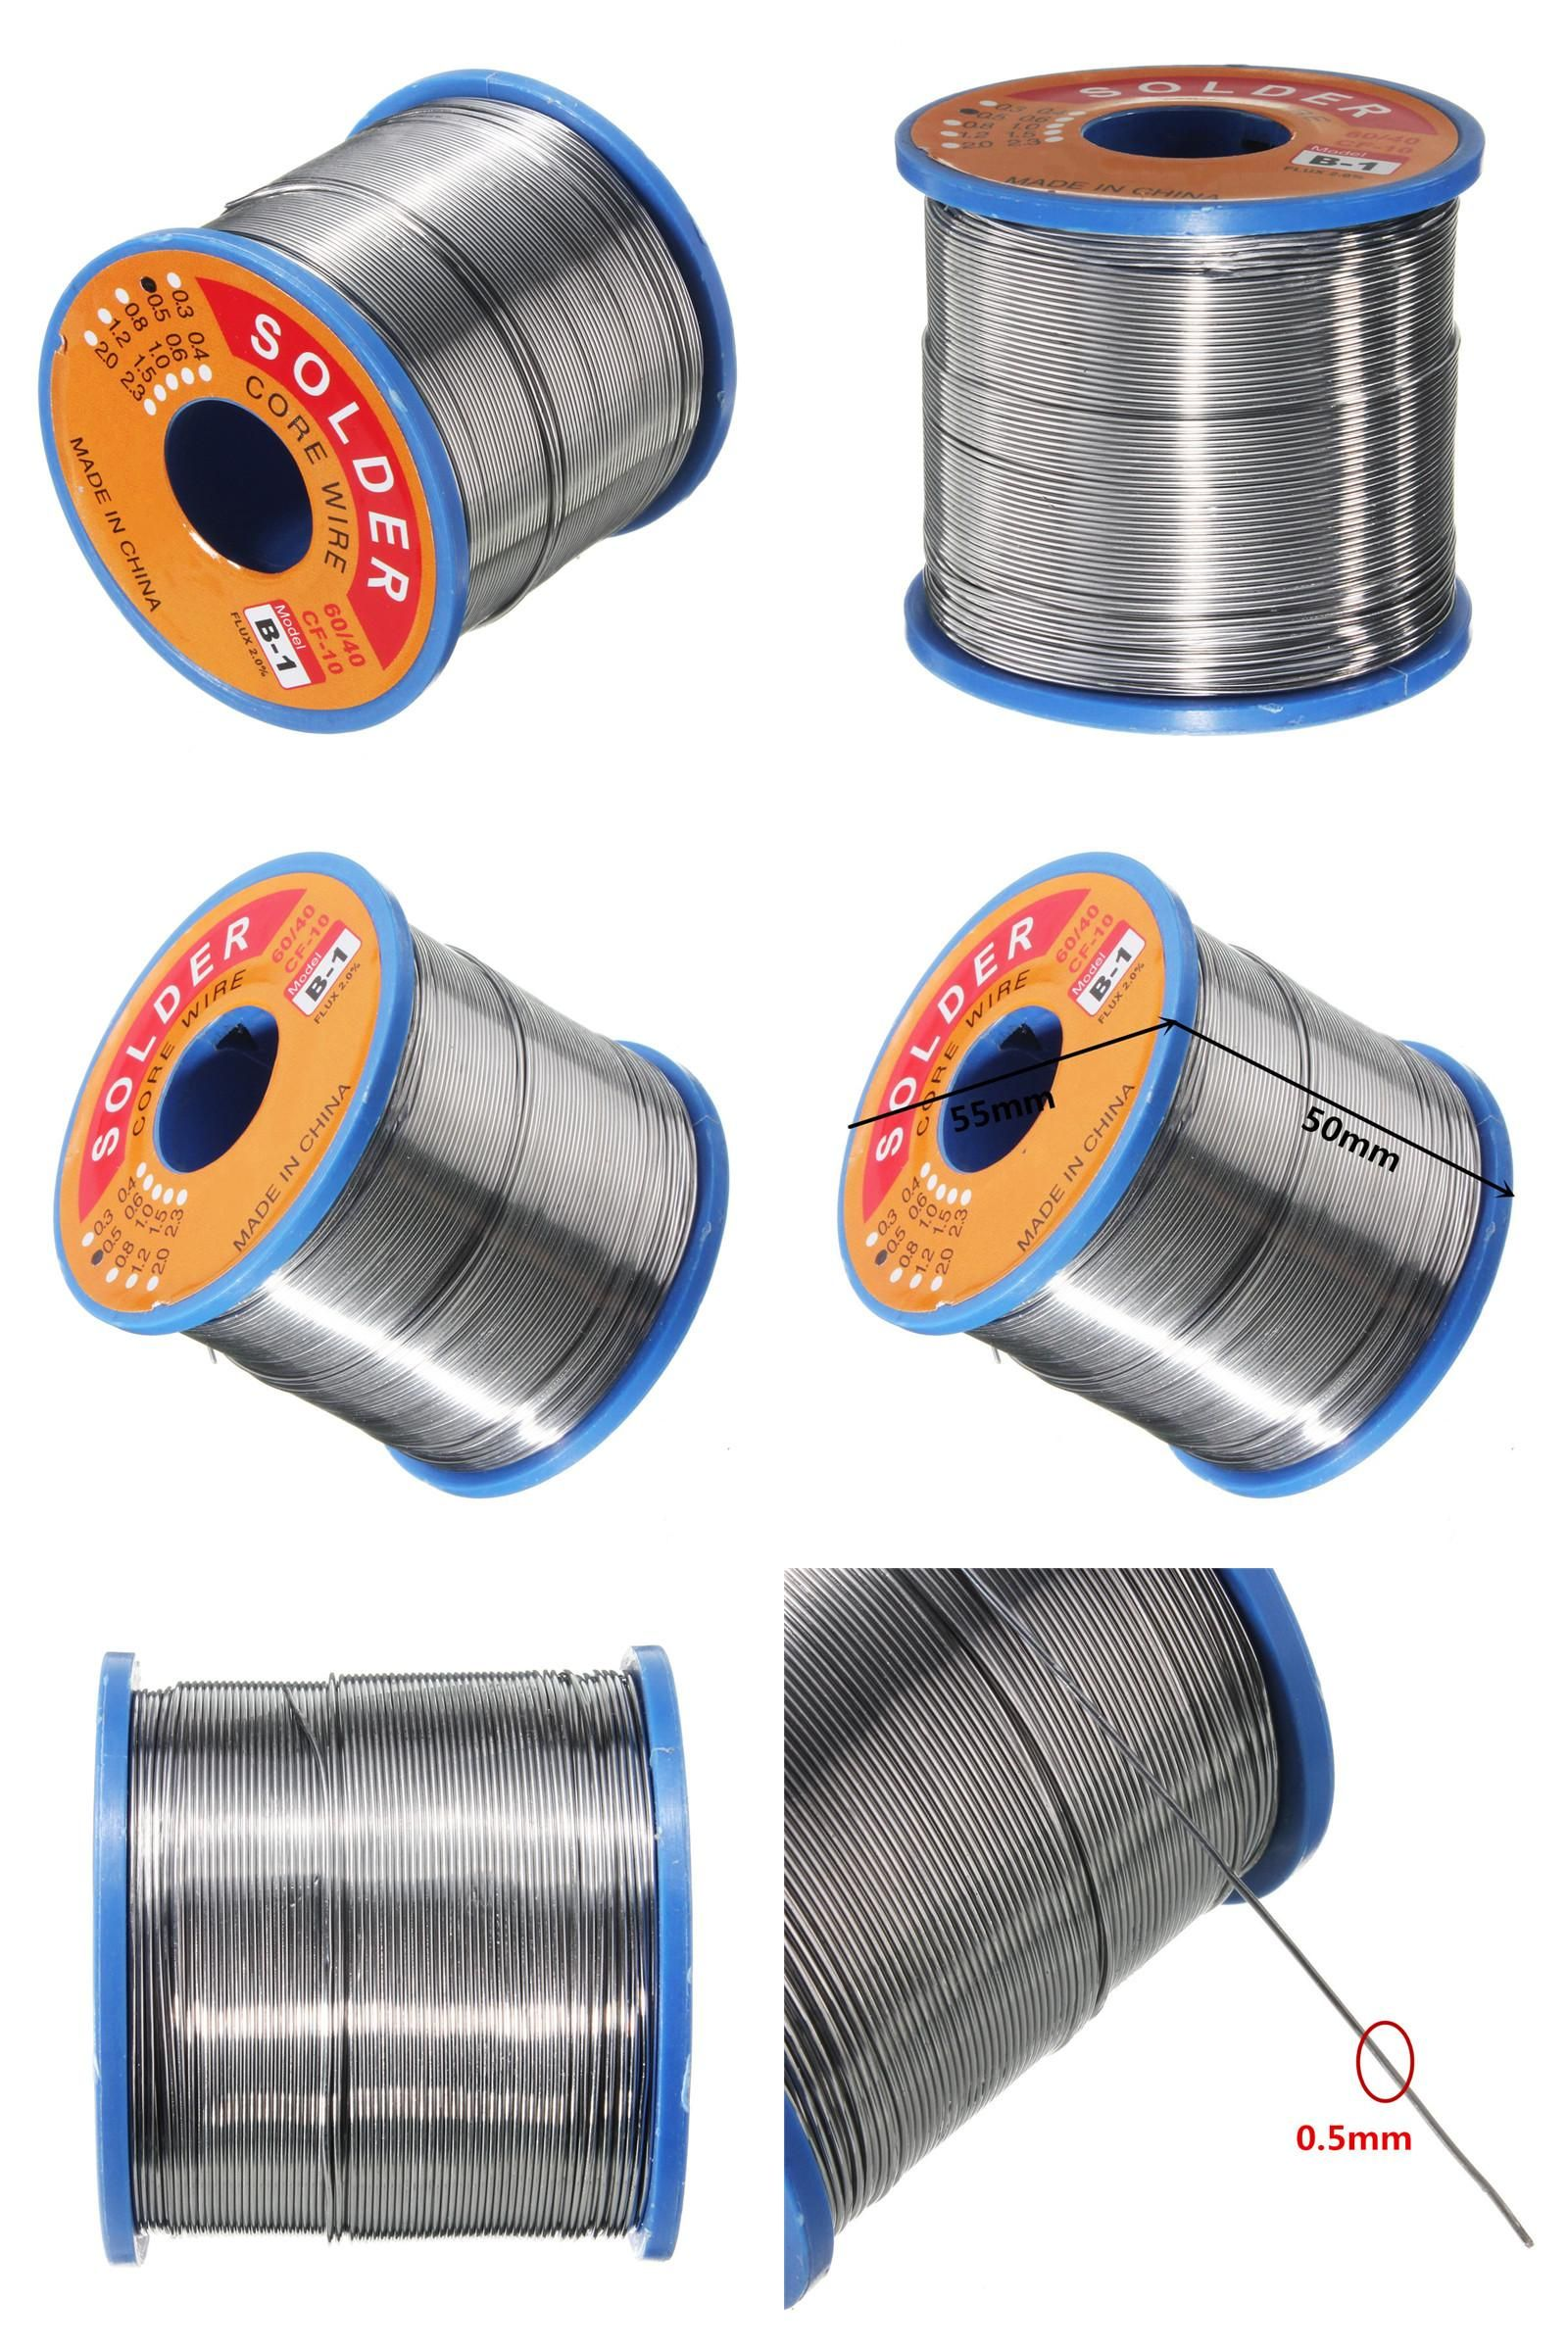 Visit To Buy 55 X 50 Mm Soldering Wire Tin Lead Line Rosin Core Flux Solder In Welding Iron Wires Reel 60 40 0 5mm 400g Ad Iron Wire Wire Reel Lead Lines